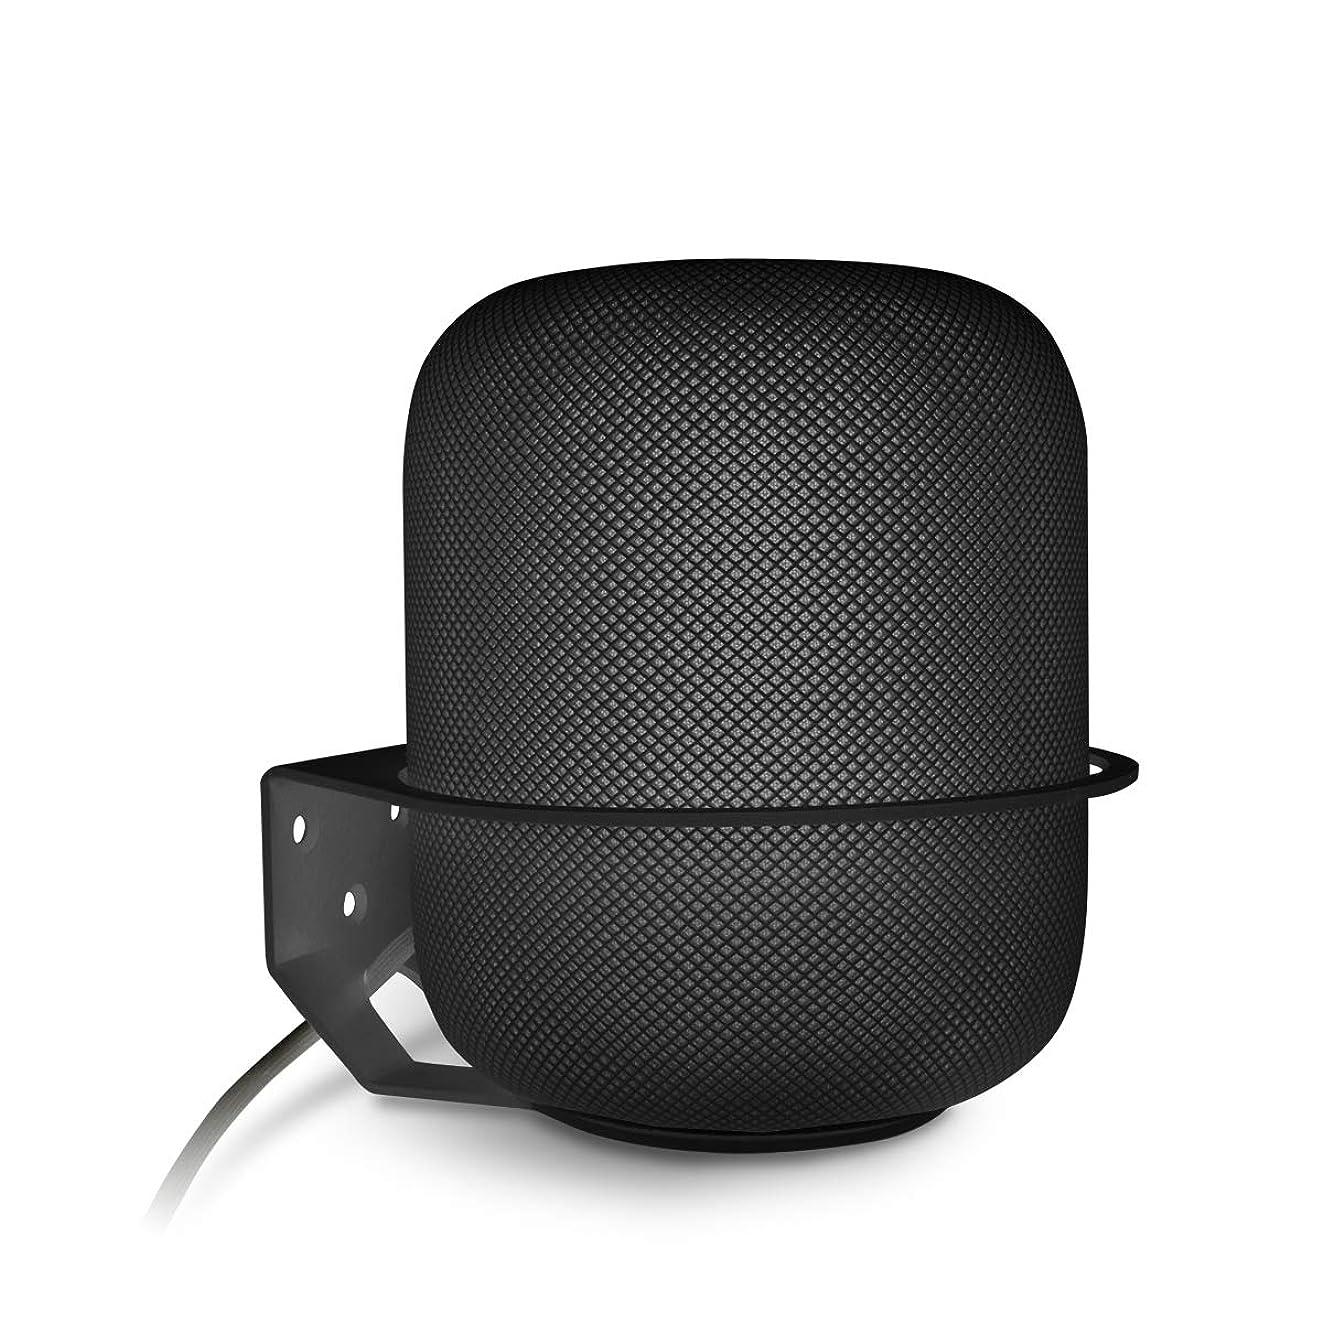 Wall Mount Compatible HomePod, ALLICAVER Sturdy Metal Made Mount Stand Holder Compatible HomePod Smart Speaker. (Black)